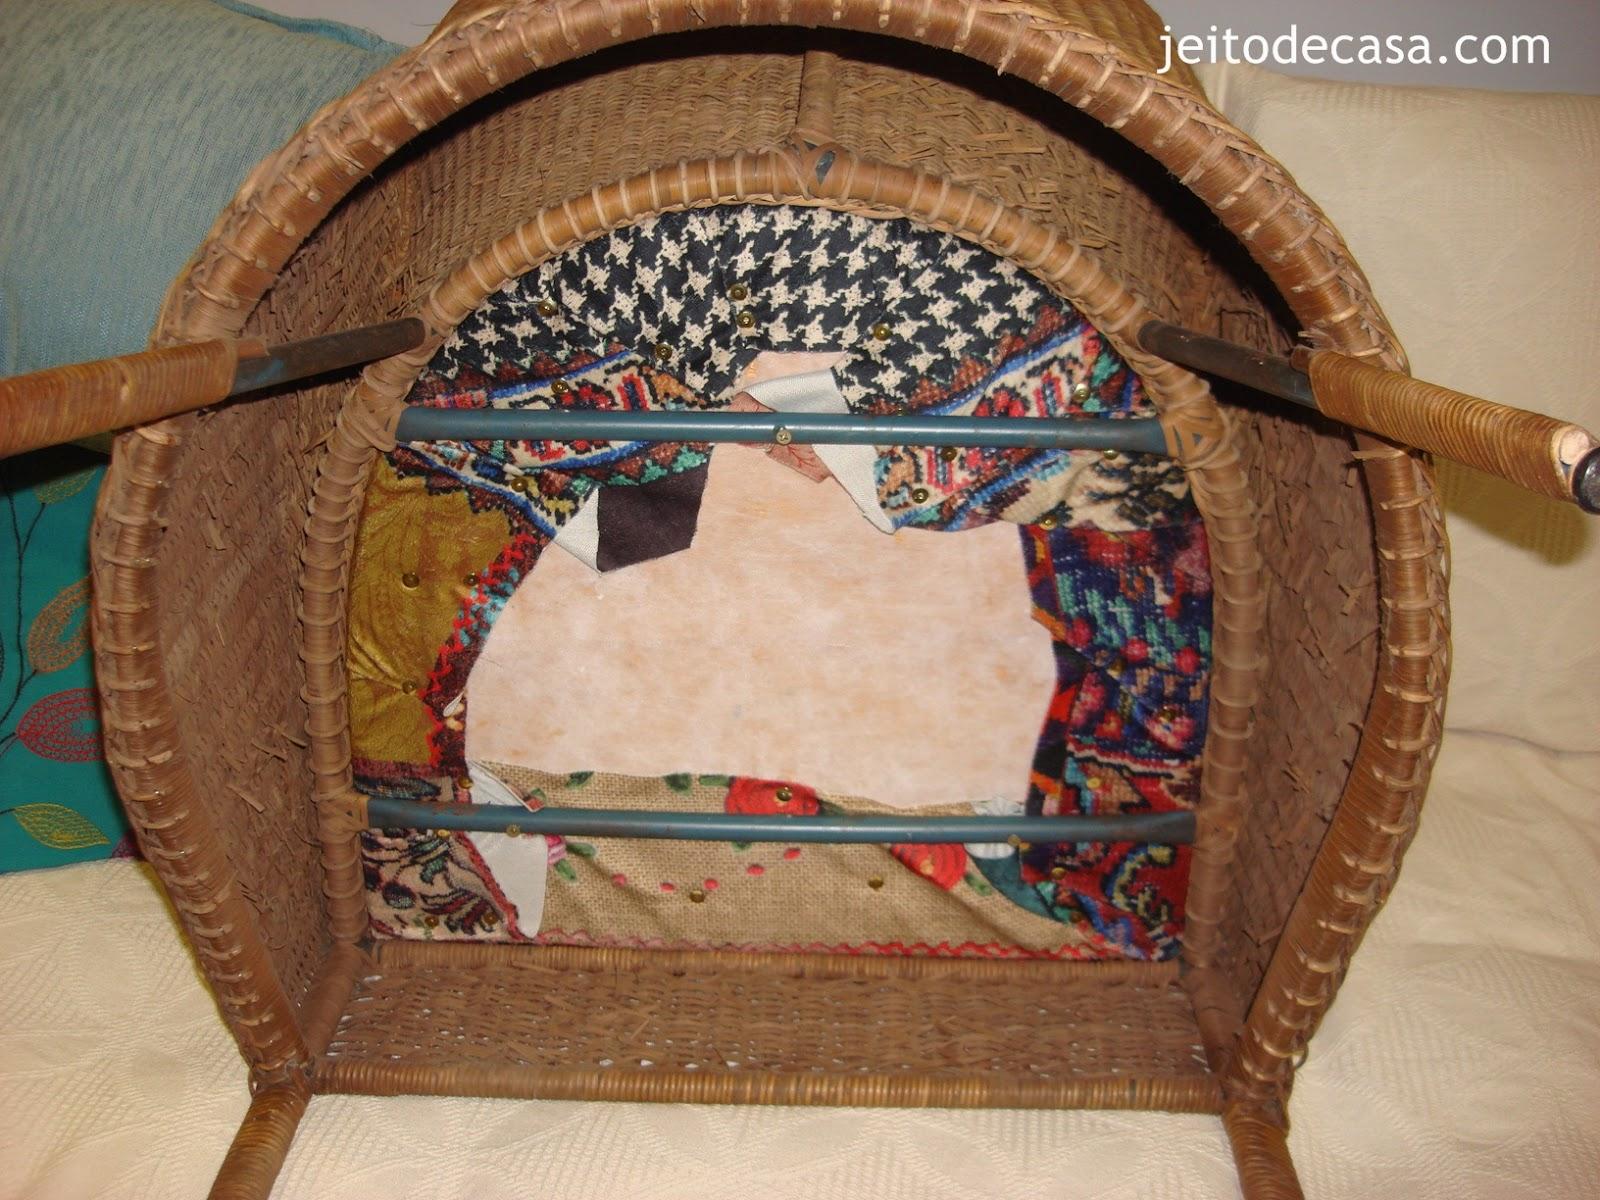 Como forrar o assento da cadeira Jeito de Casa Blog de  #71452B 1600x1200